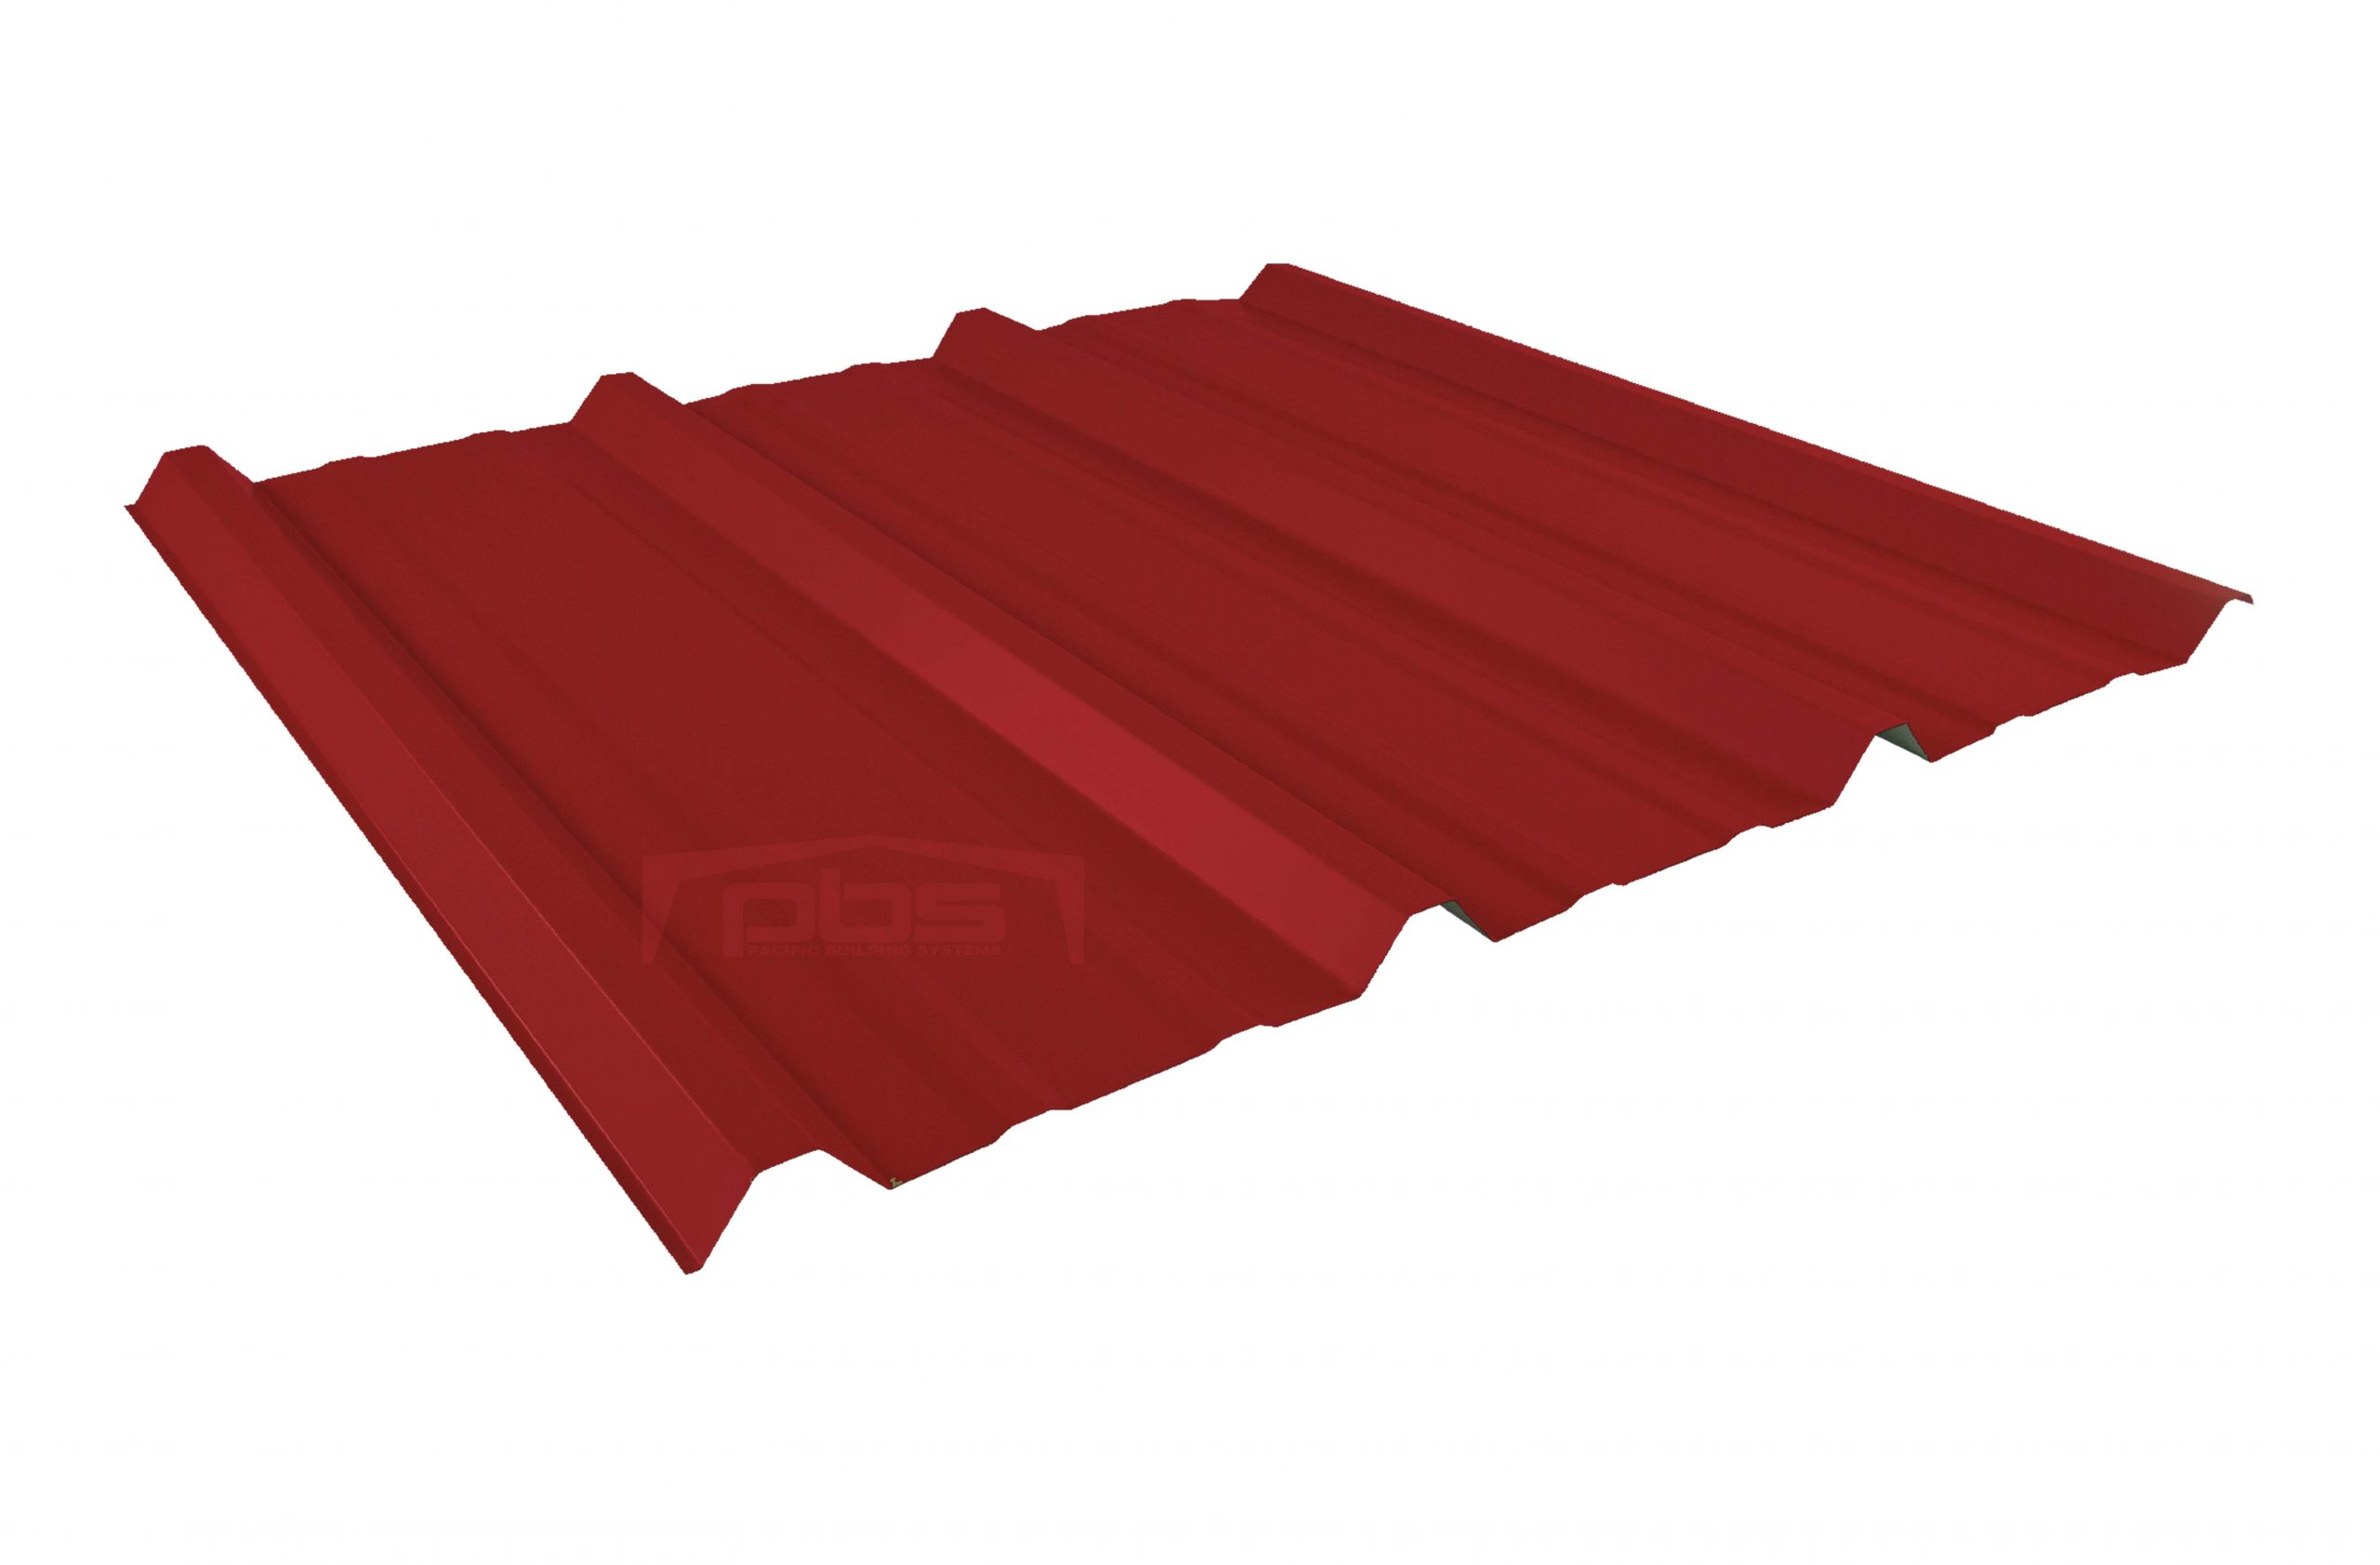 PBR Red Panel@3x